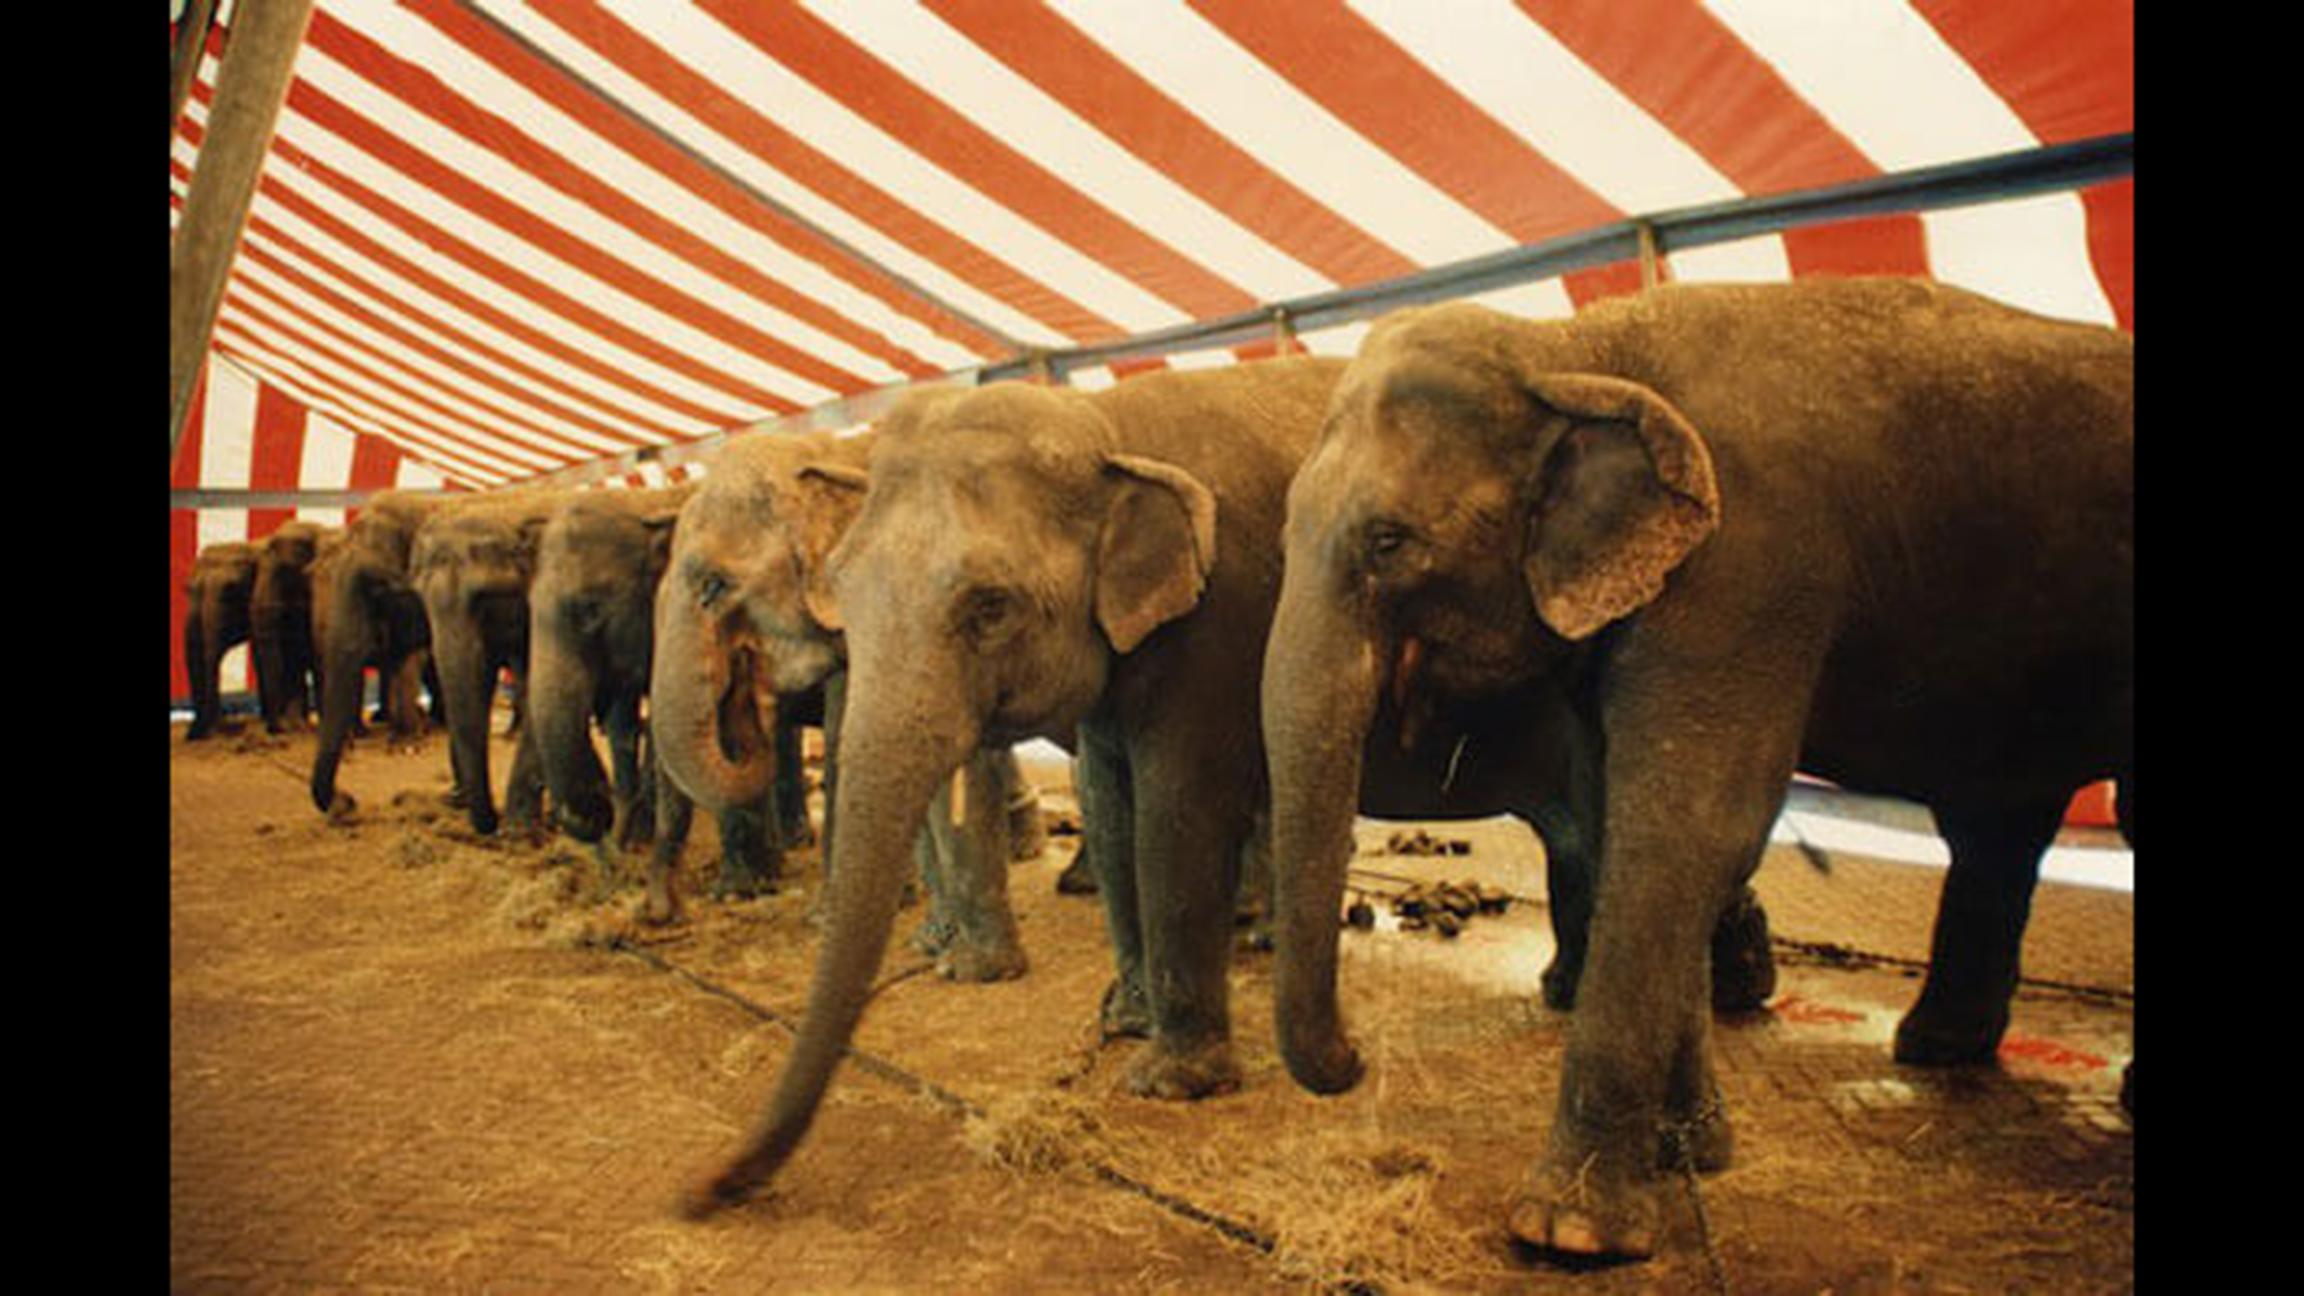 Circus Elephants to Take Final Bow in Illinois | Chicago News | WTTW